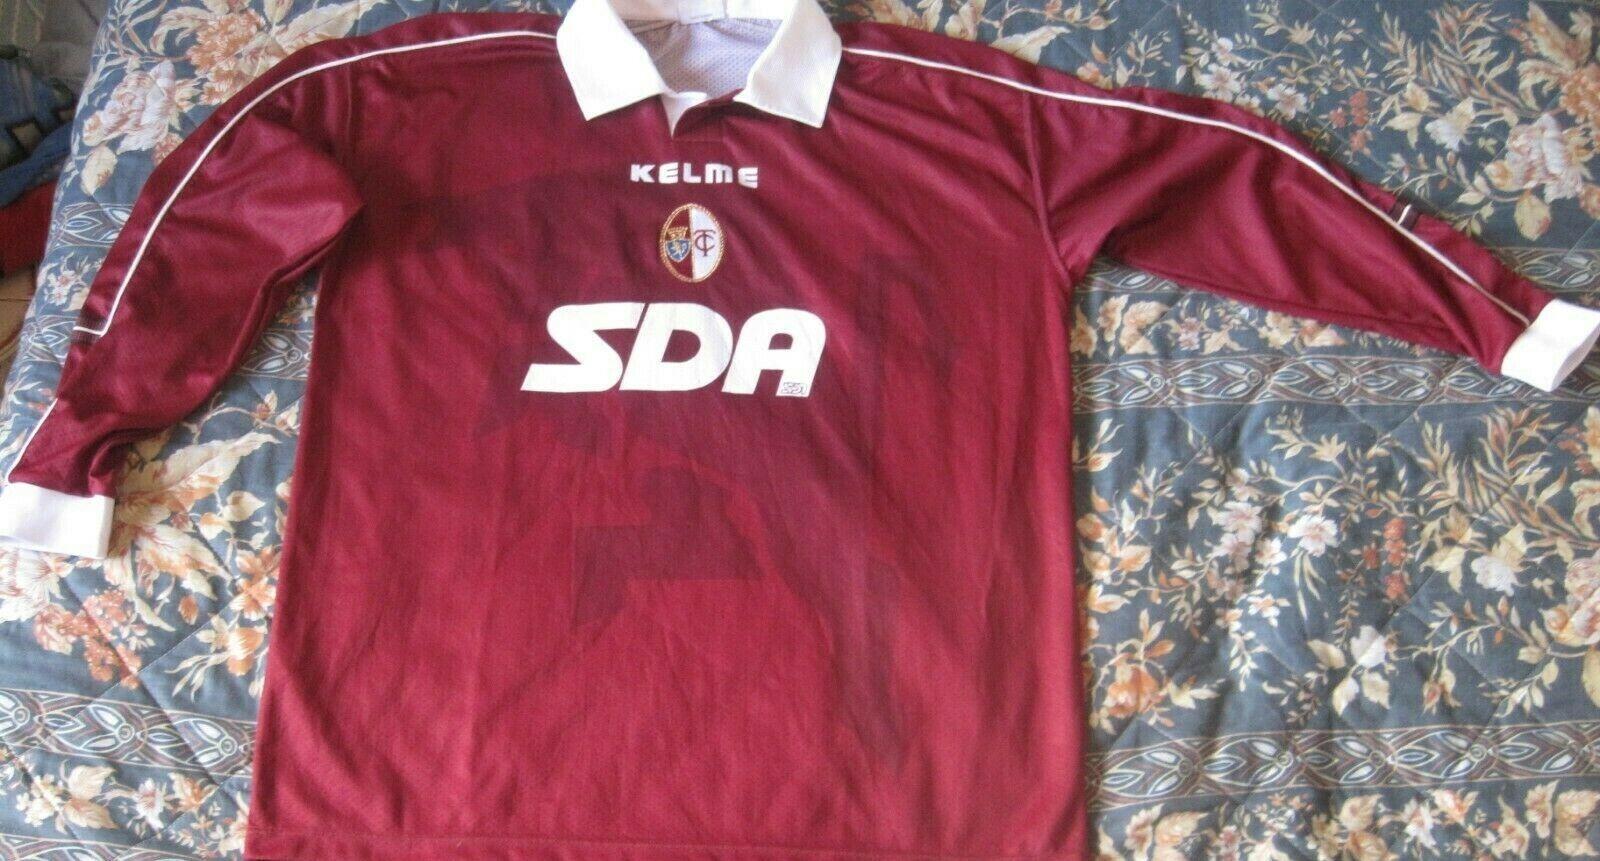 Maglia Shirt Camiseta Maillot TORINO Kelme Long Sleeve Match Worn 1998 Vintage